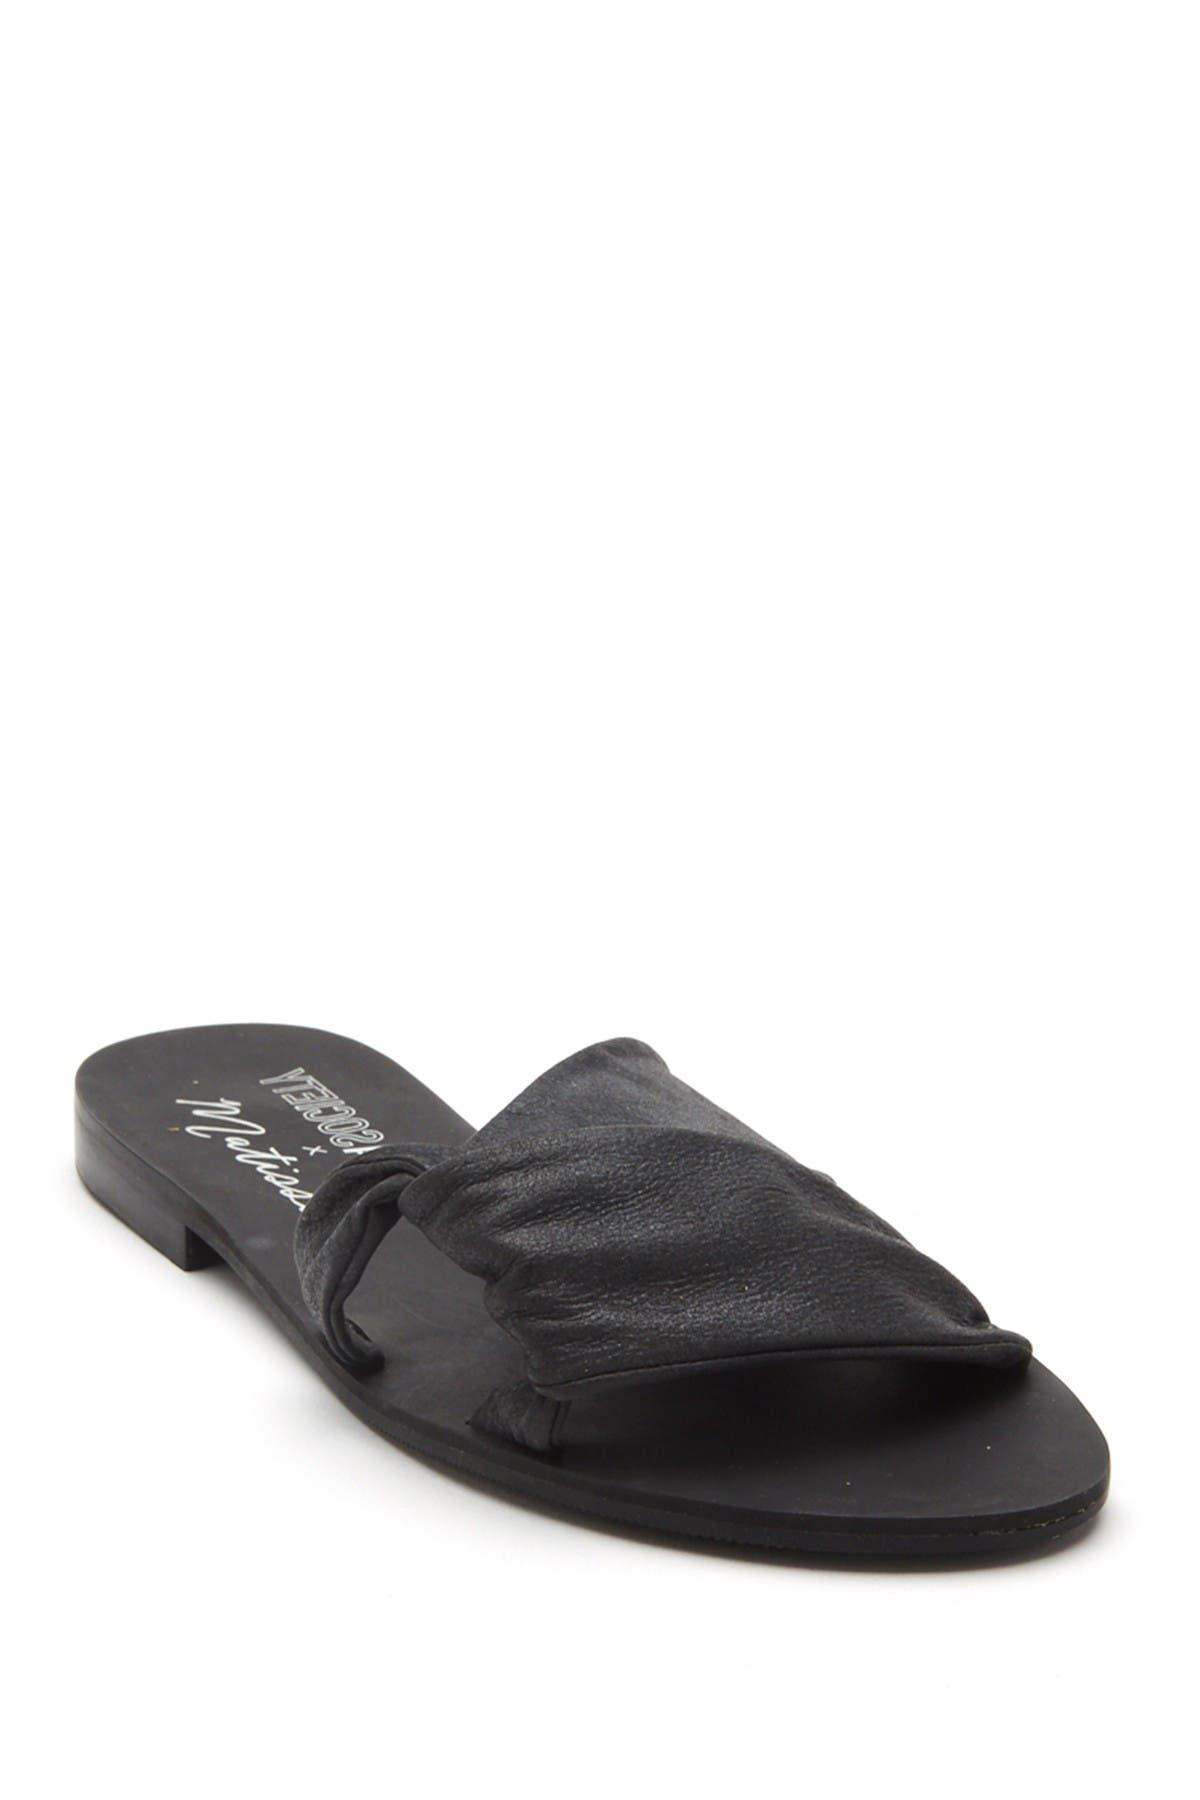 Image of Matisse Capri Slide Leather Sandal